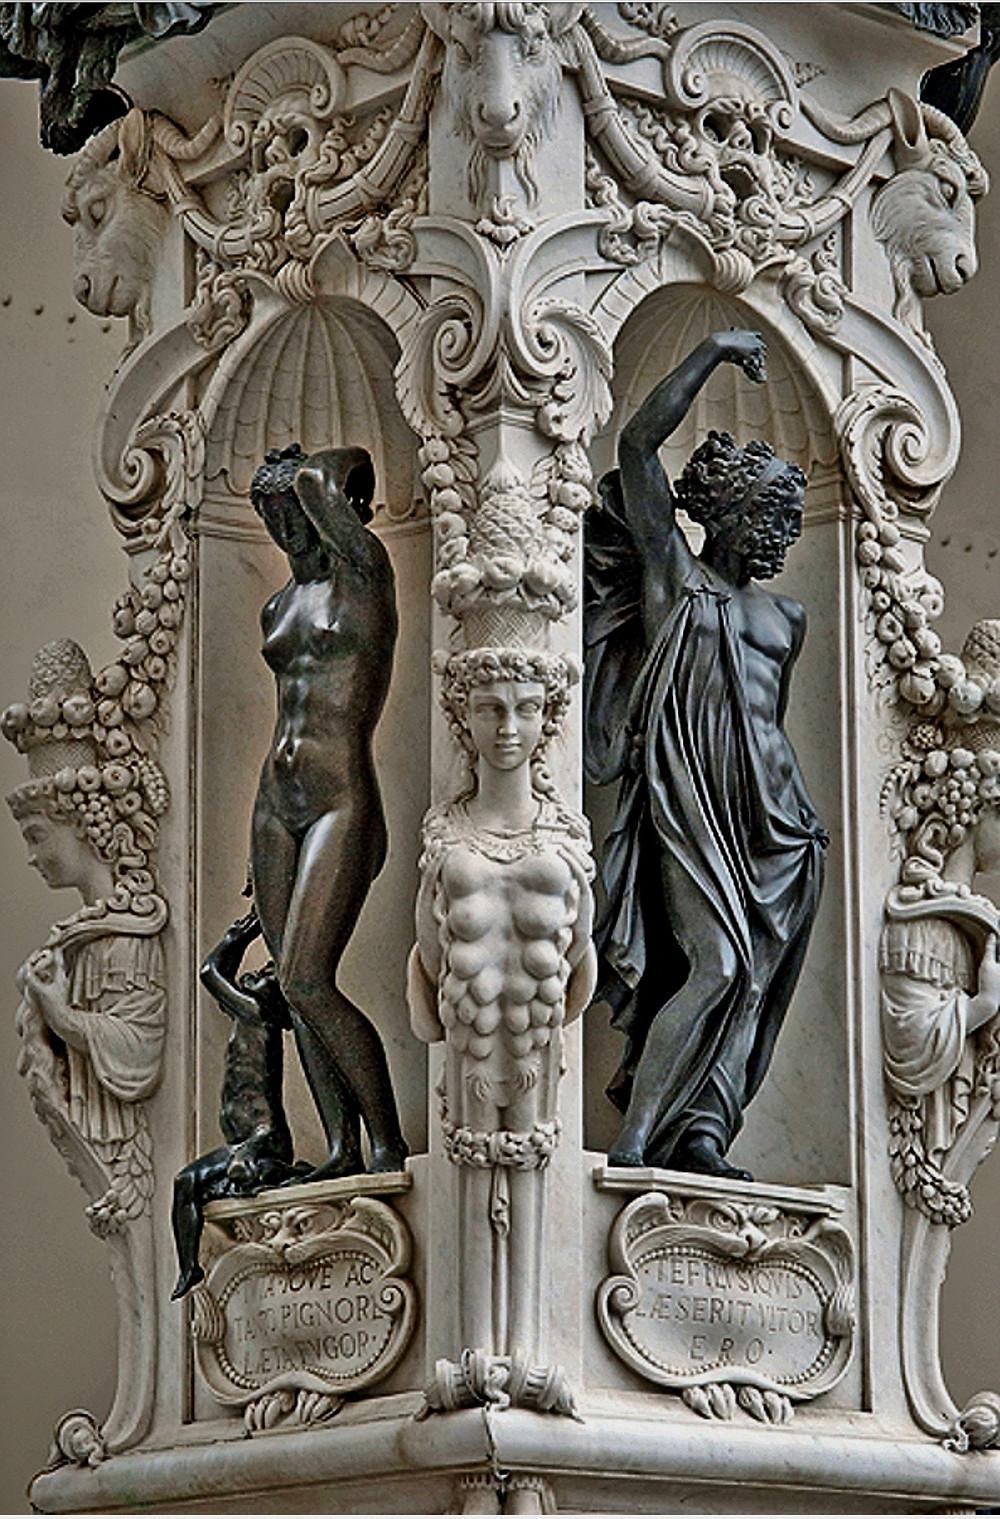 the original pedestal of Cellini's Perseus sculpture